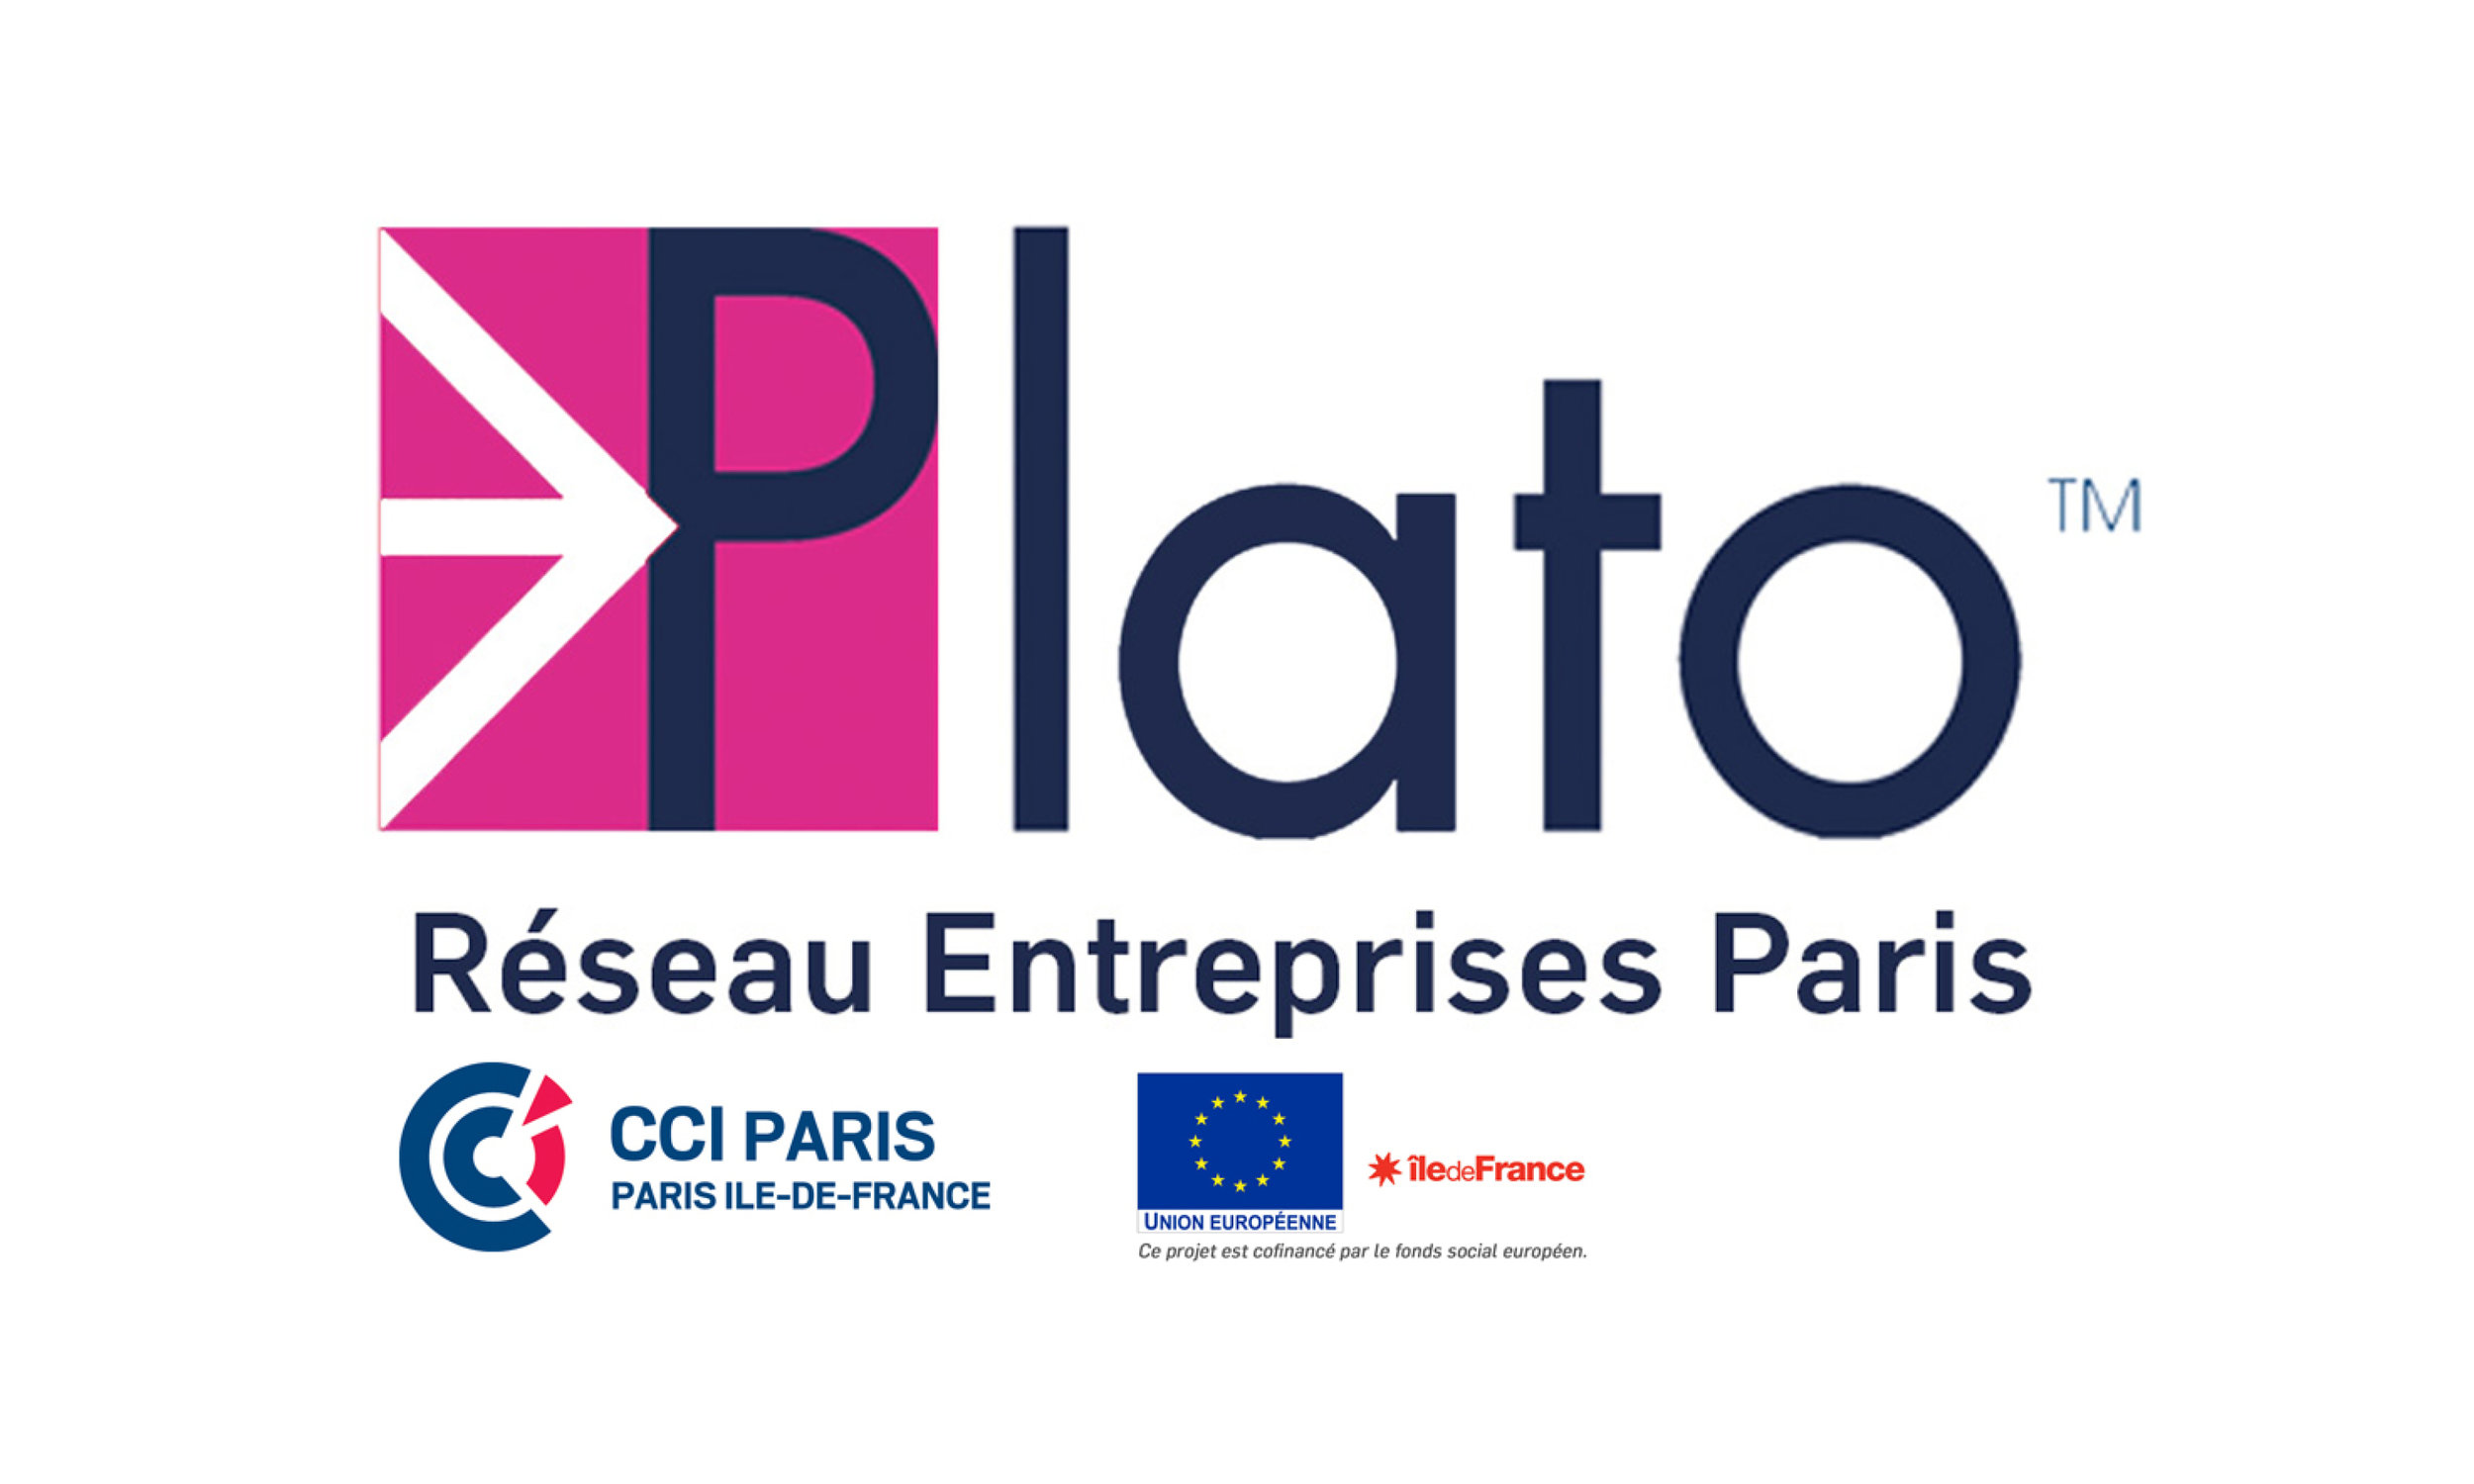 Logo-Plato-Reseau-Entreprises-Paris1bis.jpg